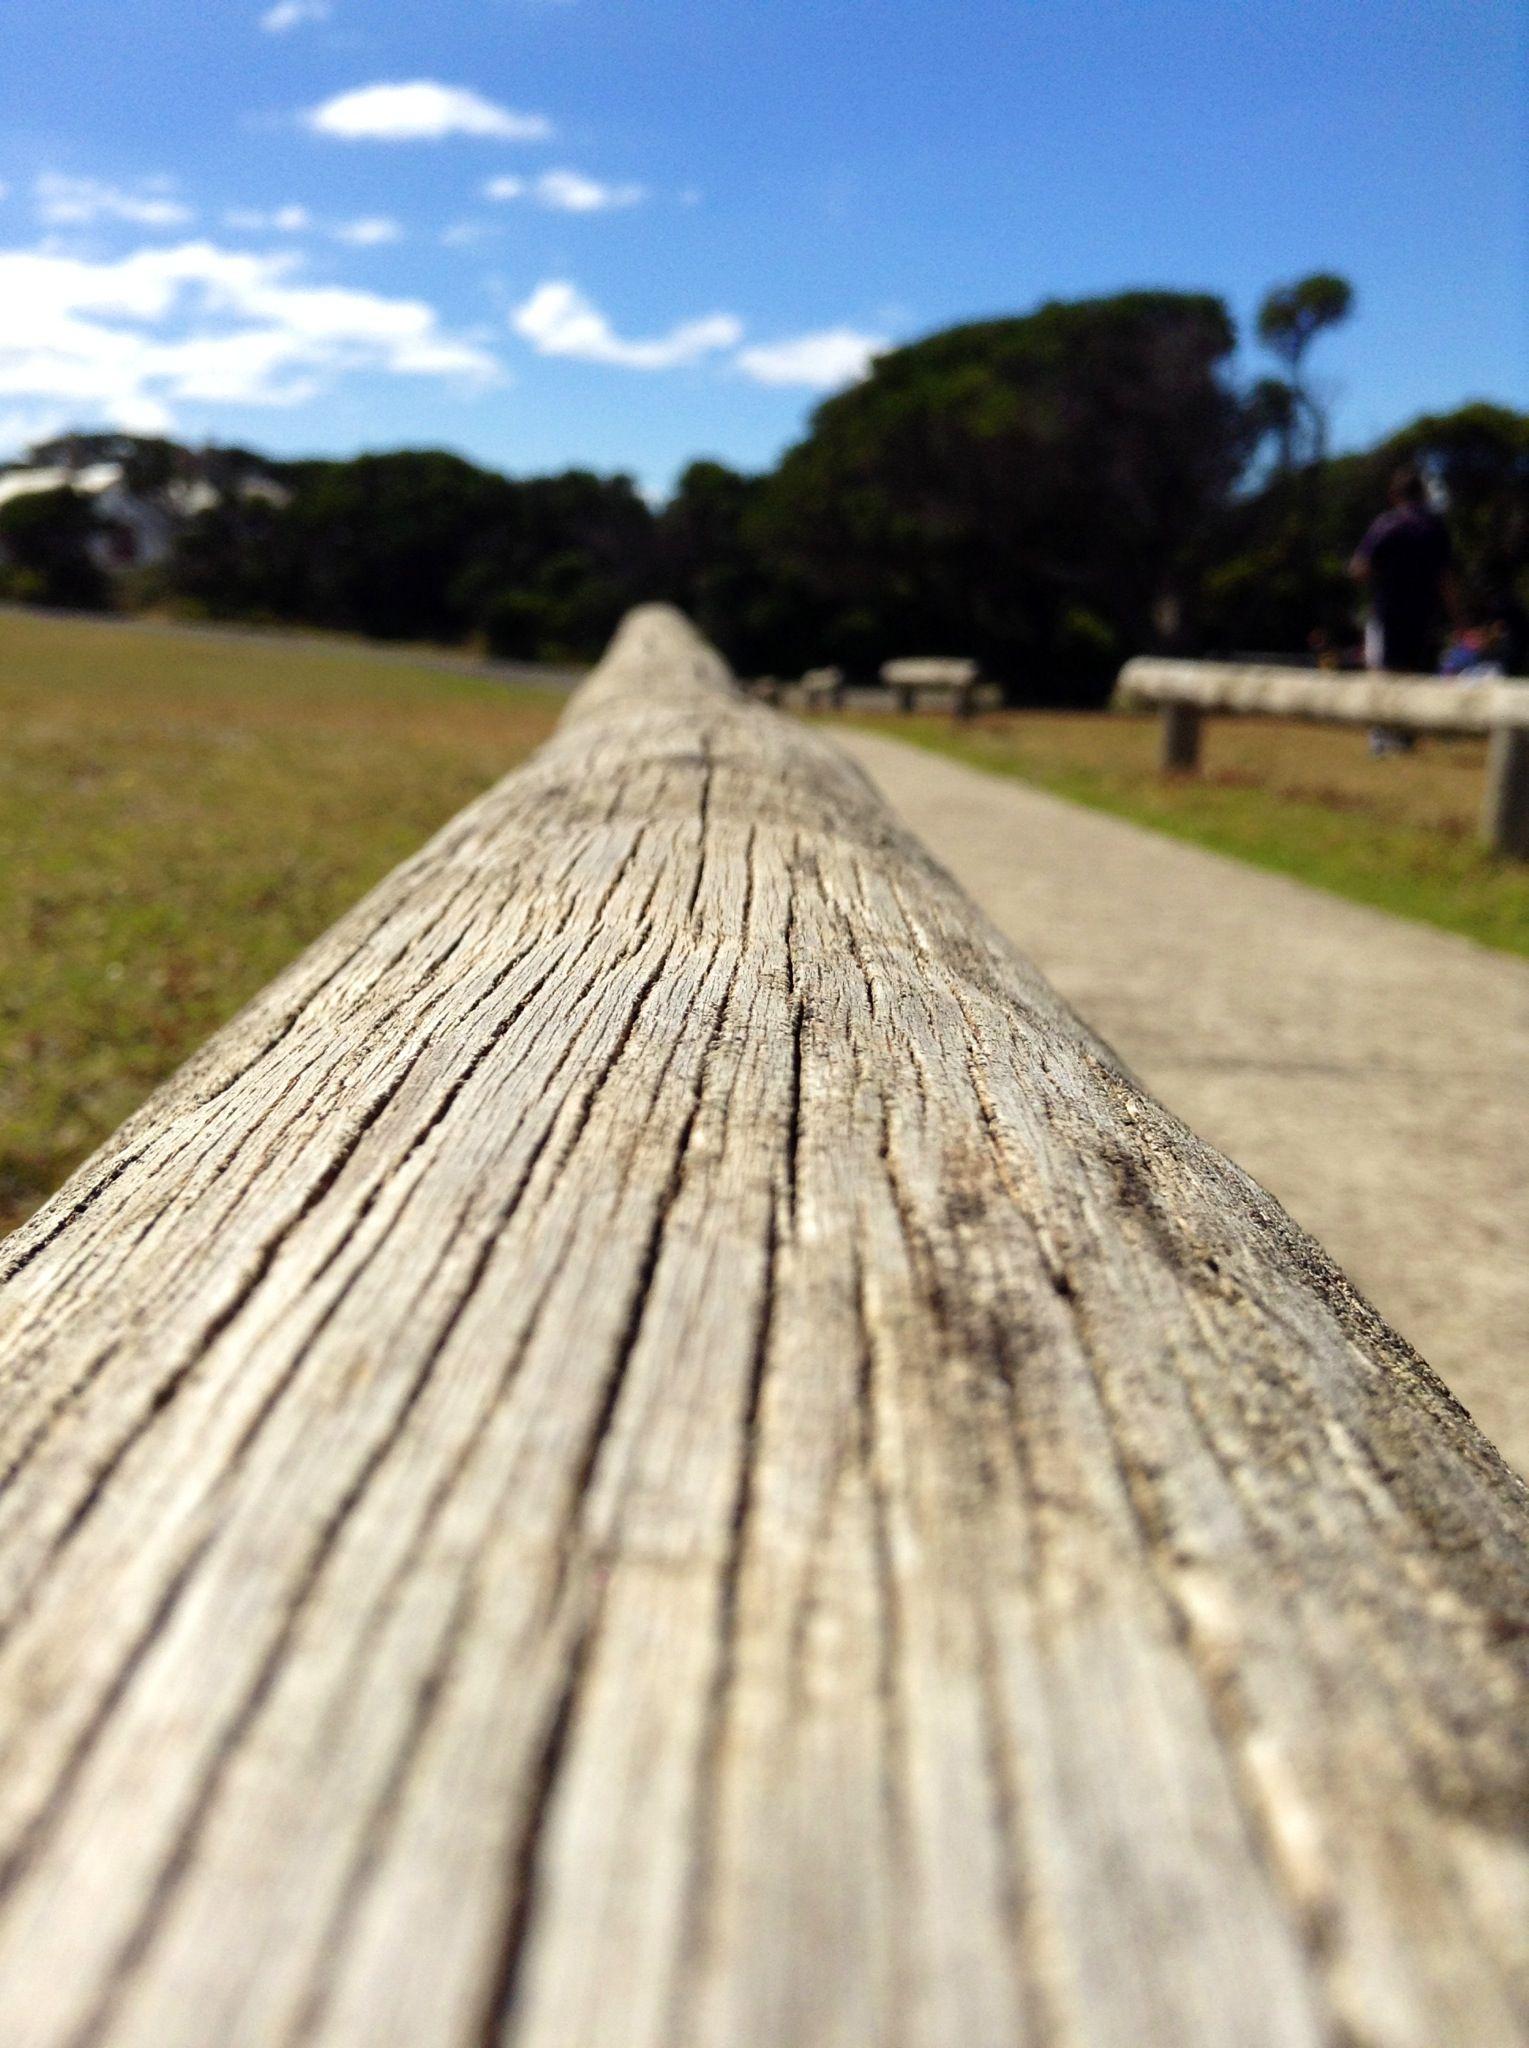 A beautiful sitting log.